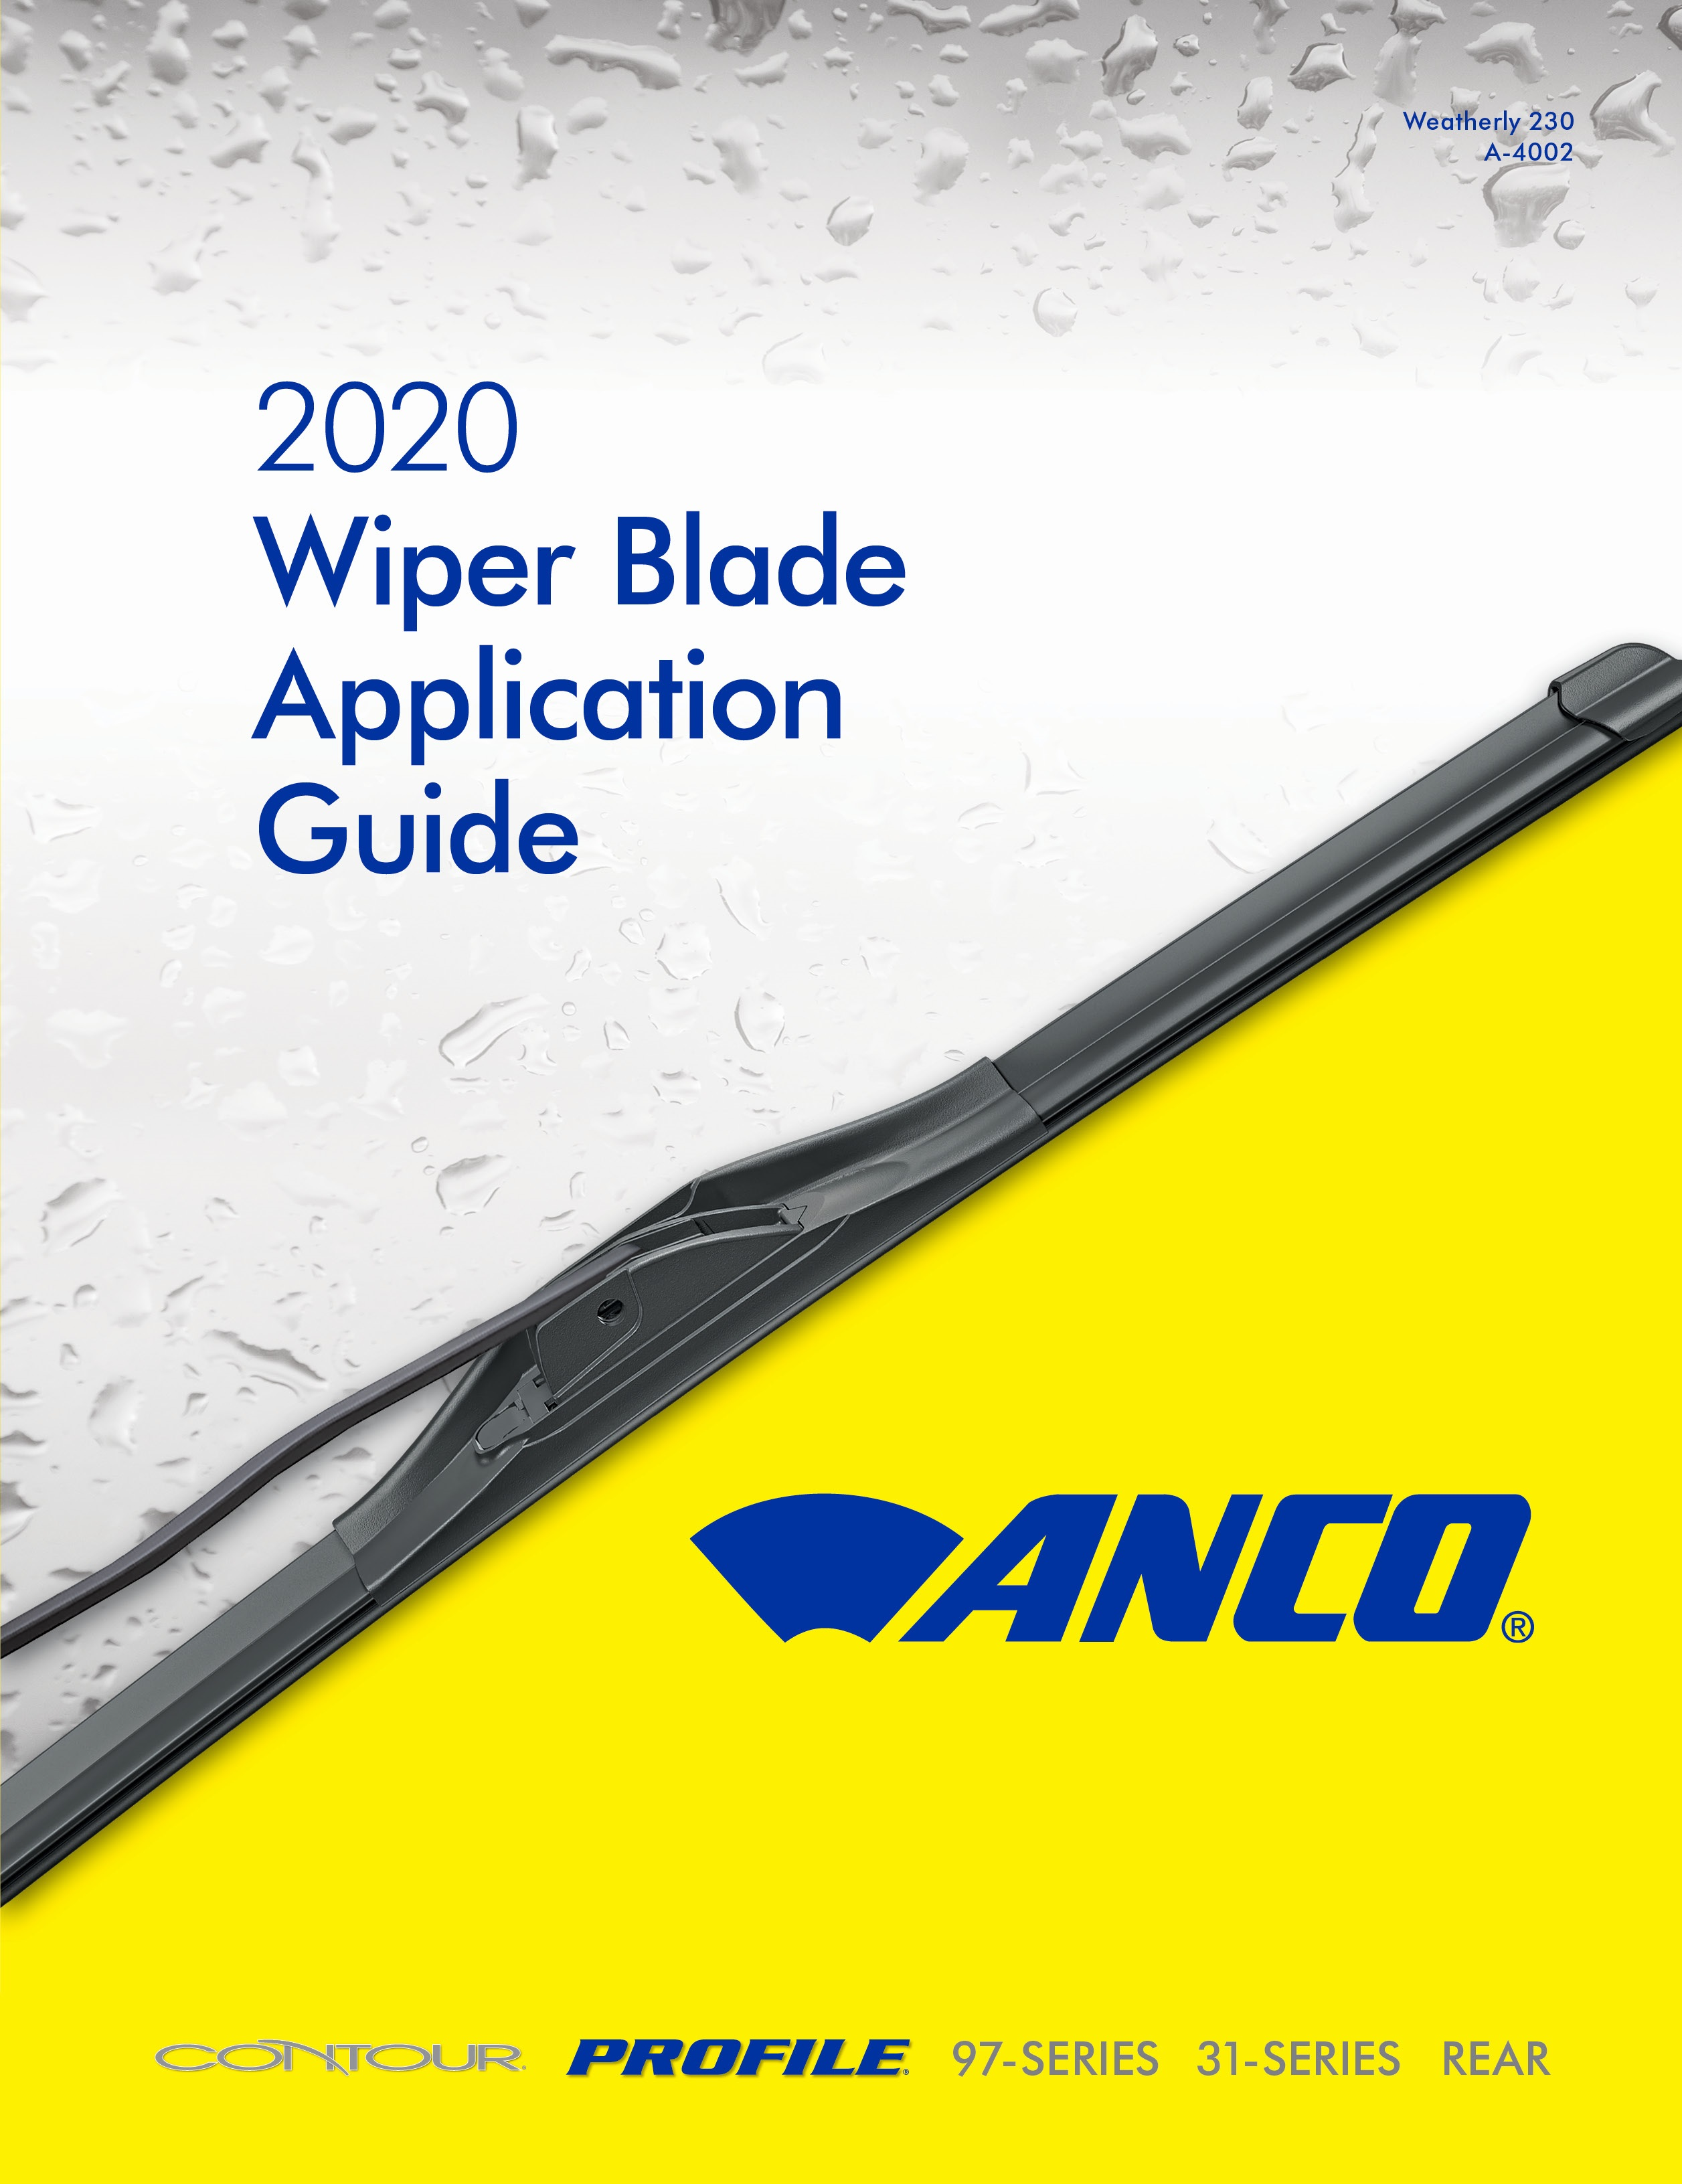 Trico Releases Anco Wiper Blade Application Guide